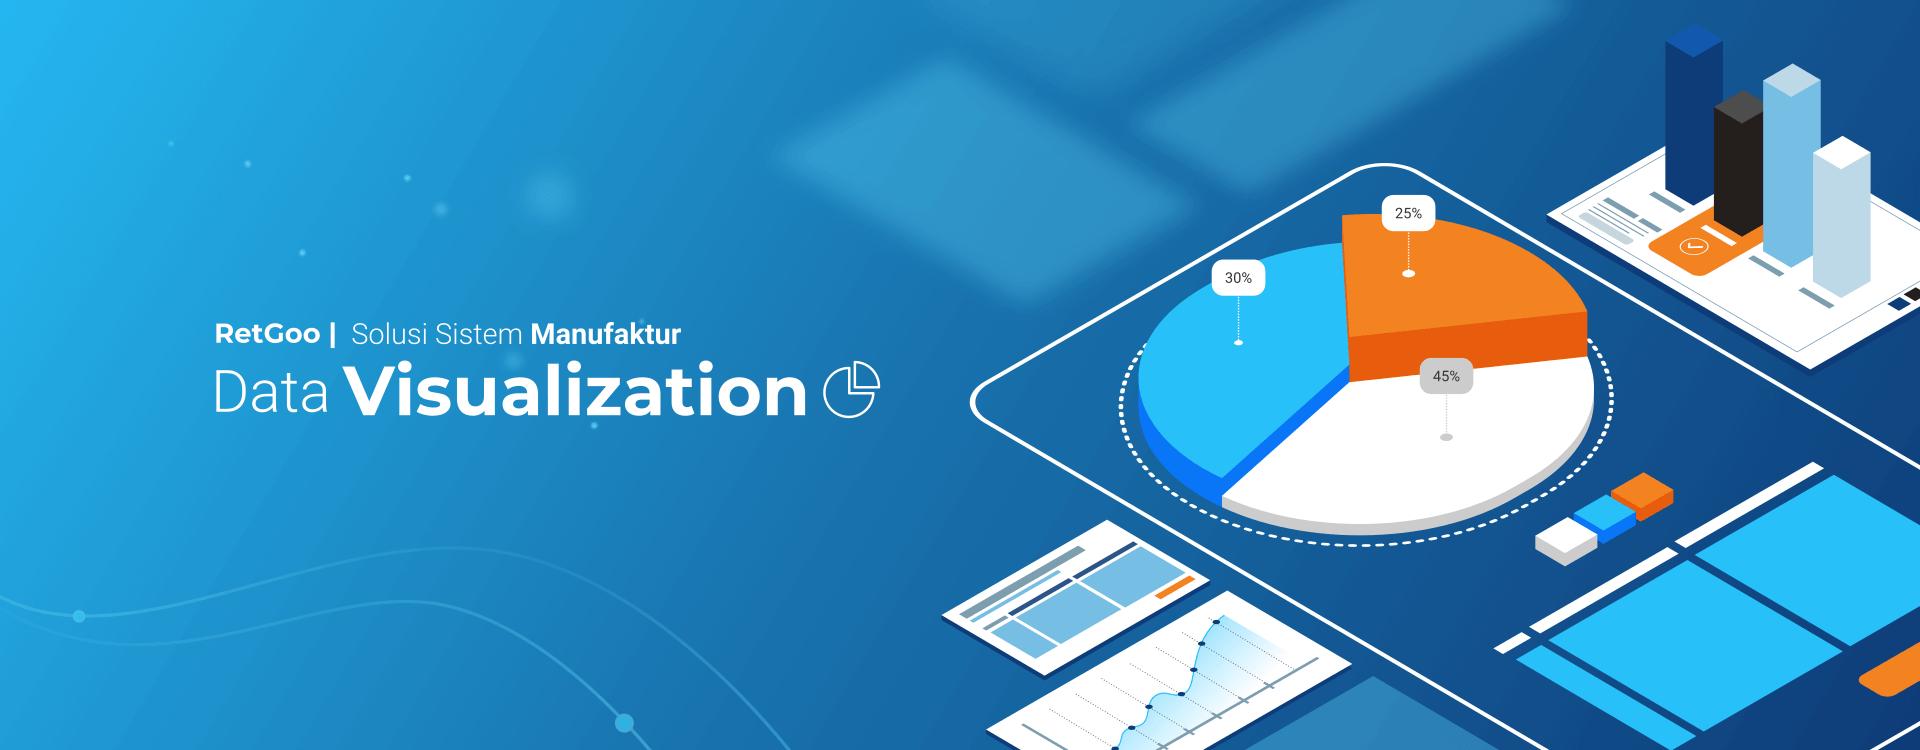 header - MFKTR visualisasi data